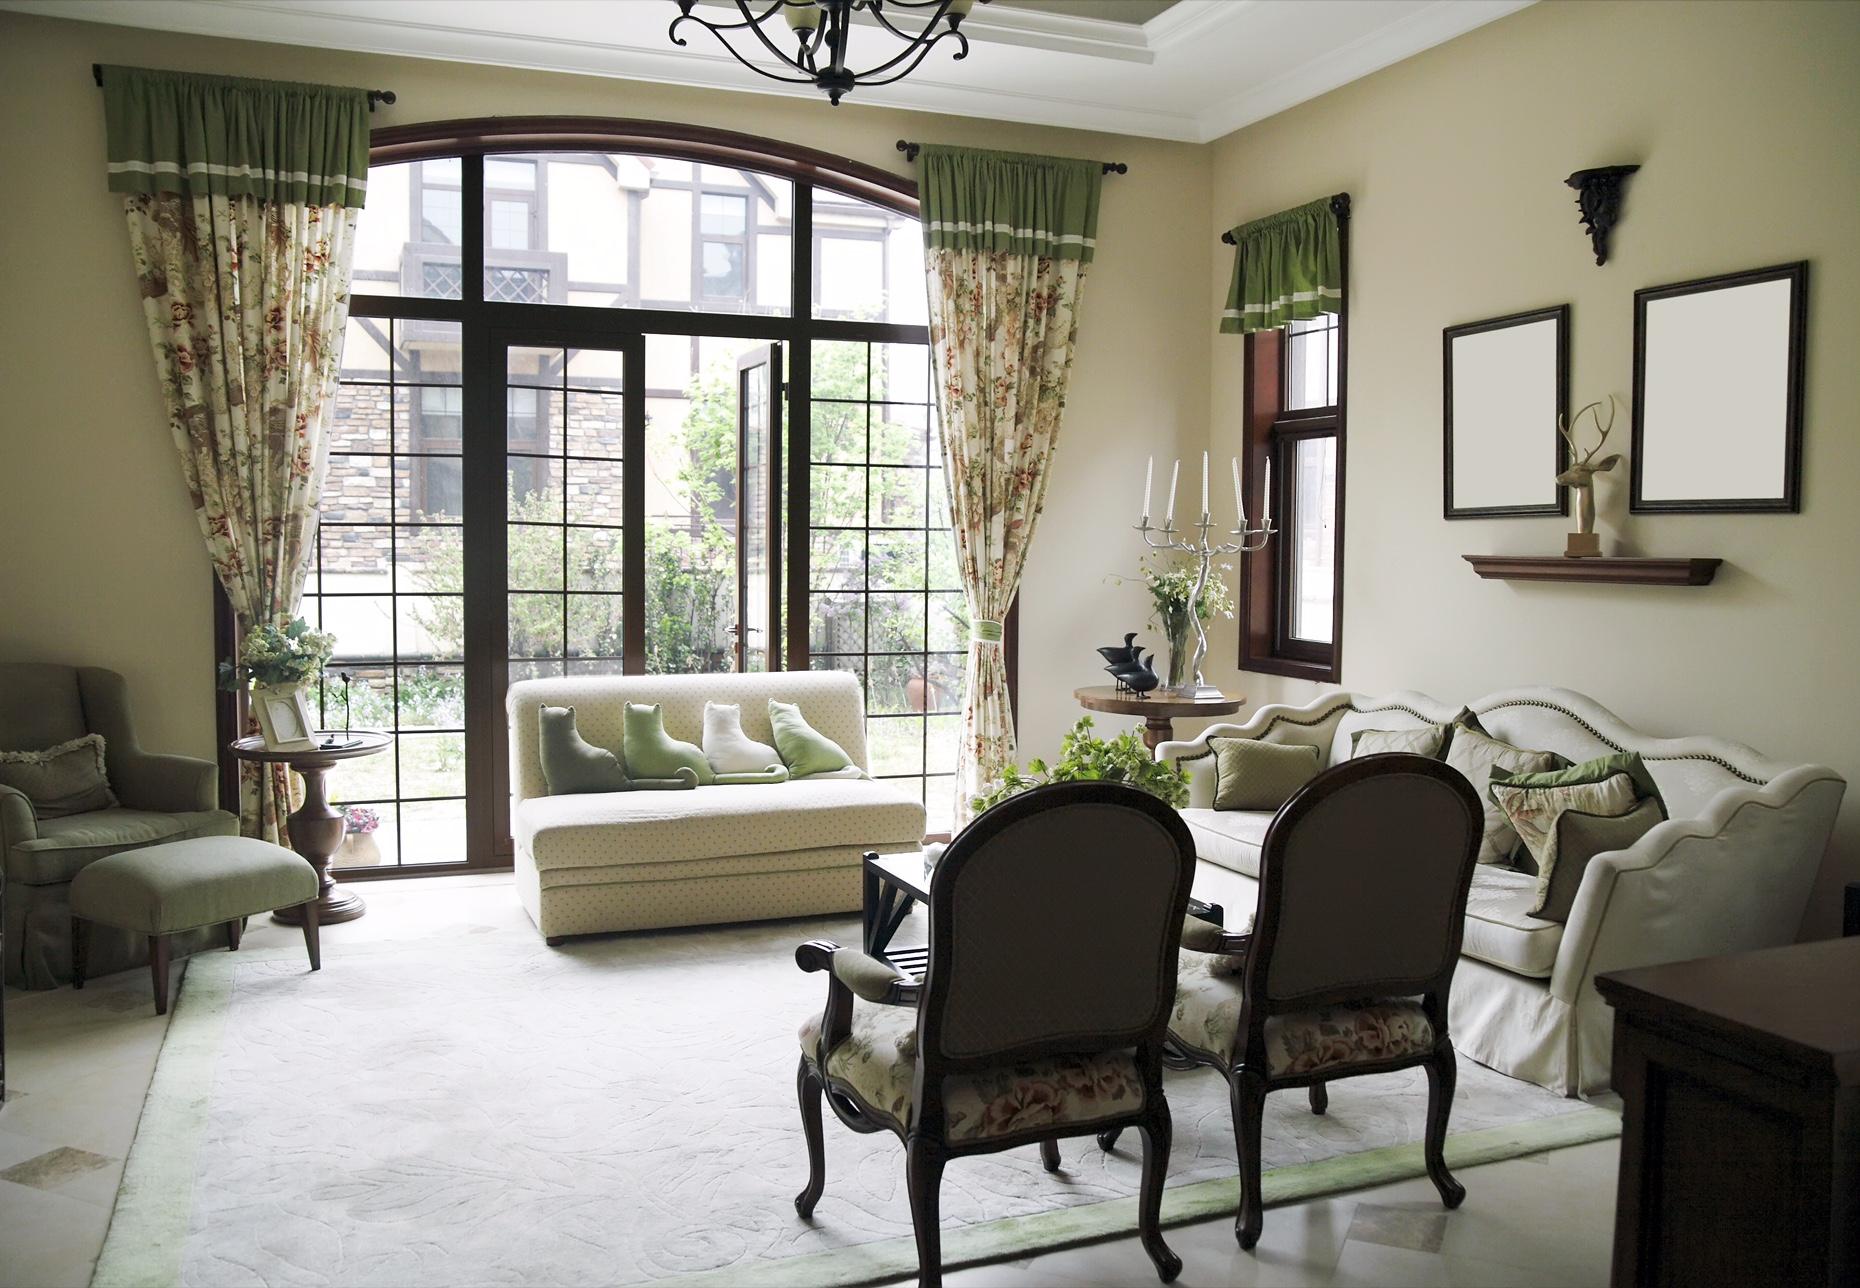 Window Treatment and Living Room Interior Design